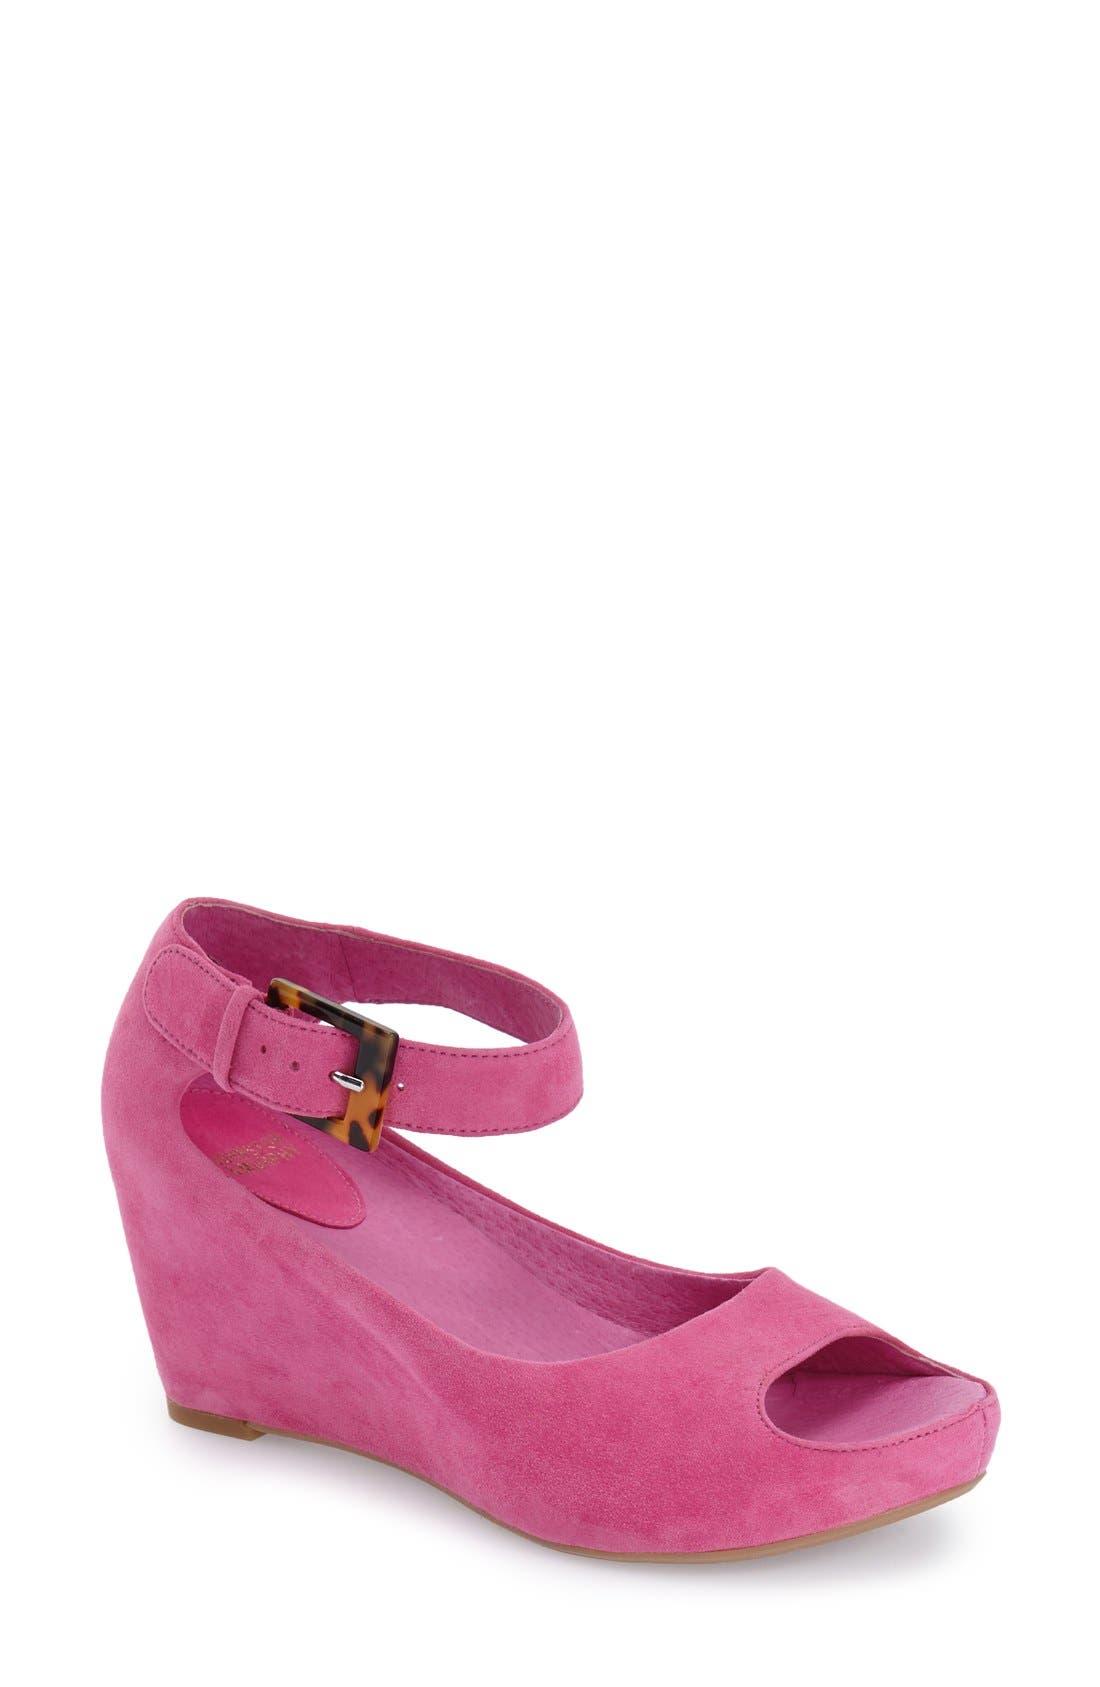 'Tricia' Ankle Strap Sandal,                             Main thumbnail 10, color,